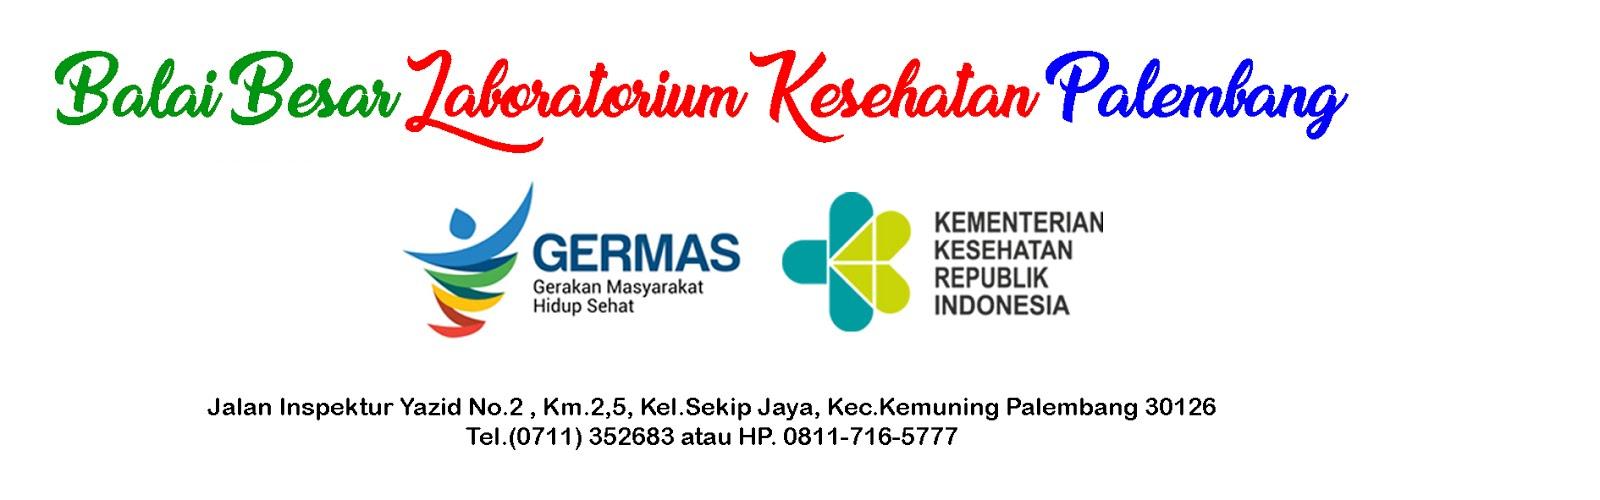 Balai Besar laboratorium Kesehatan Palembang